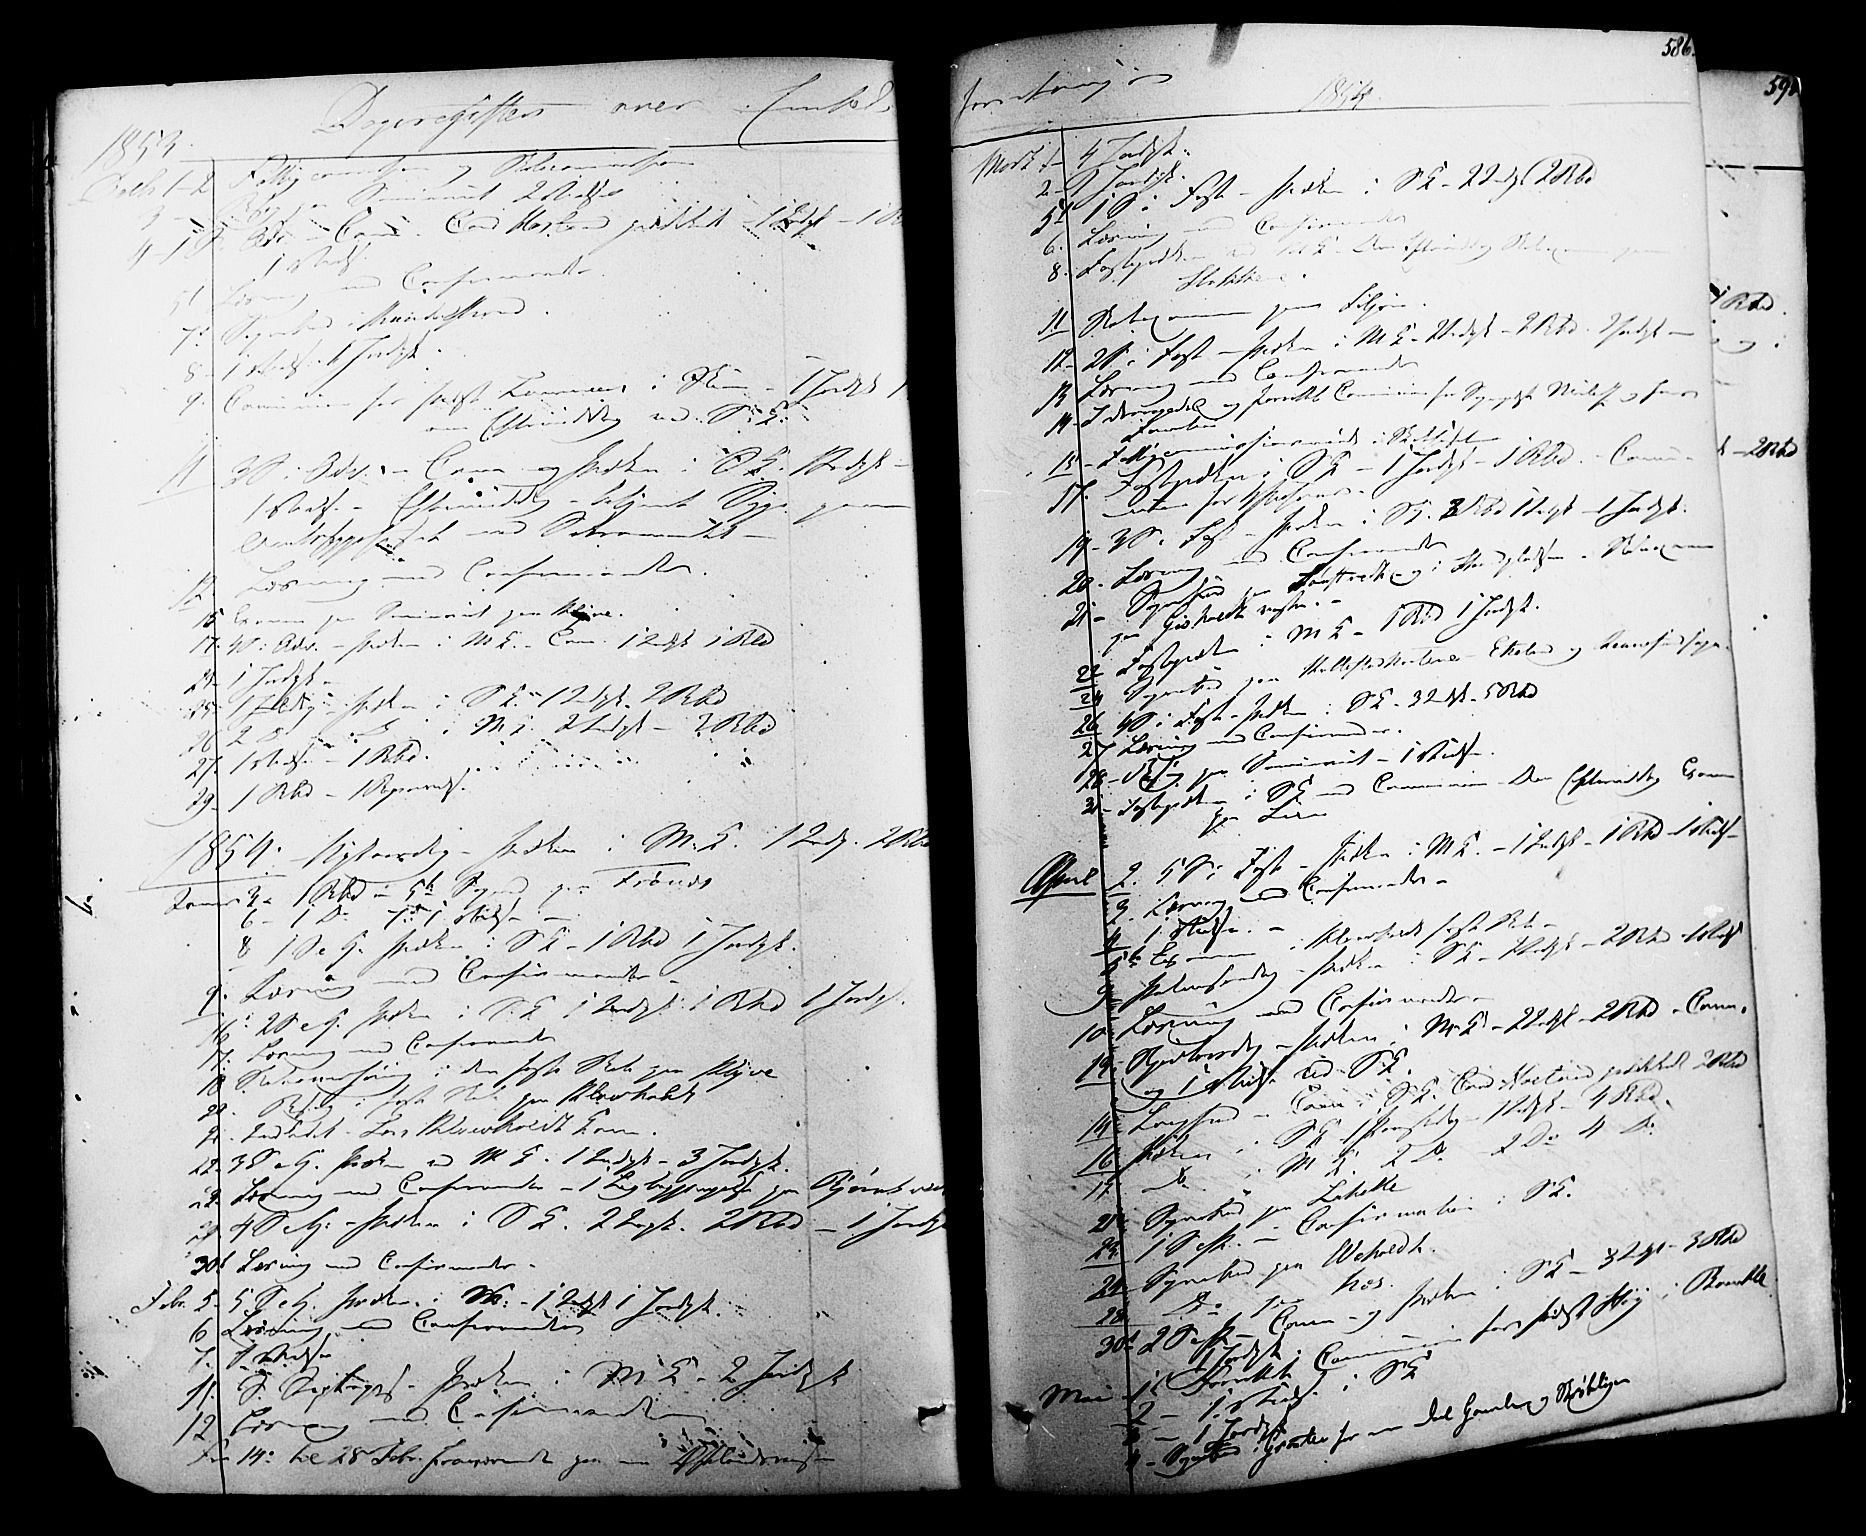 SAKO, Solum kirkebøker, F/Fa/L0006: Ministerialbok nr. I 6, 1844-1855, s. 586